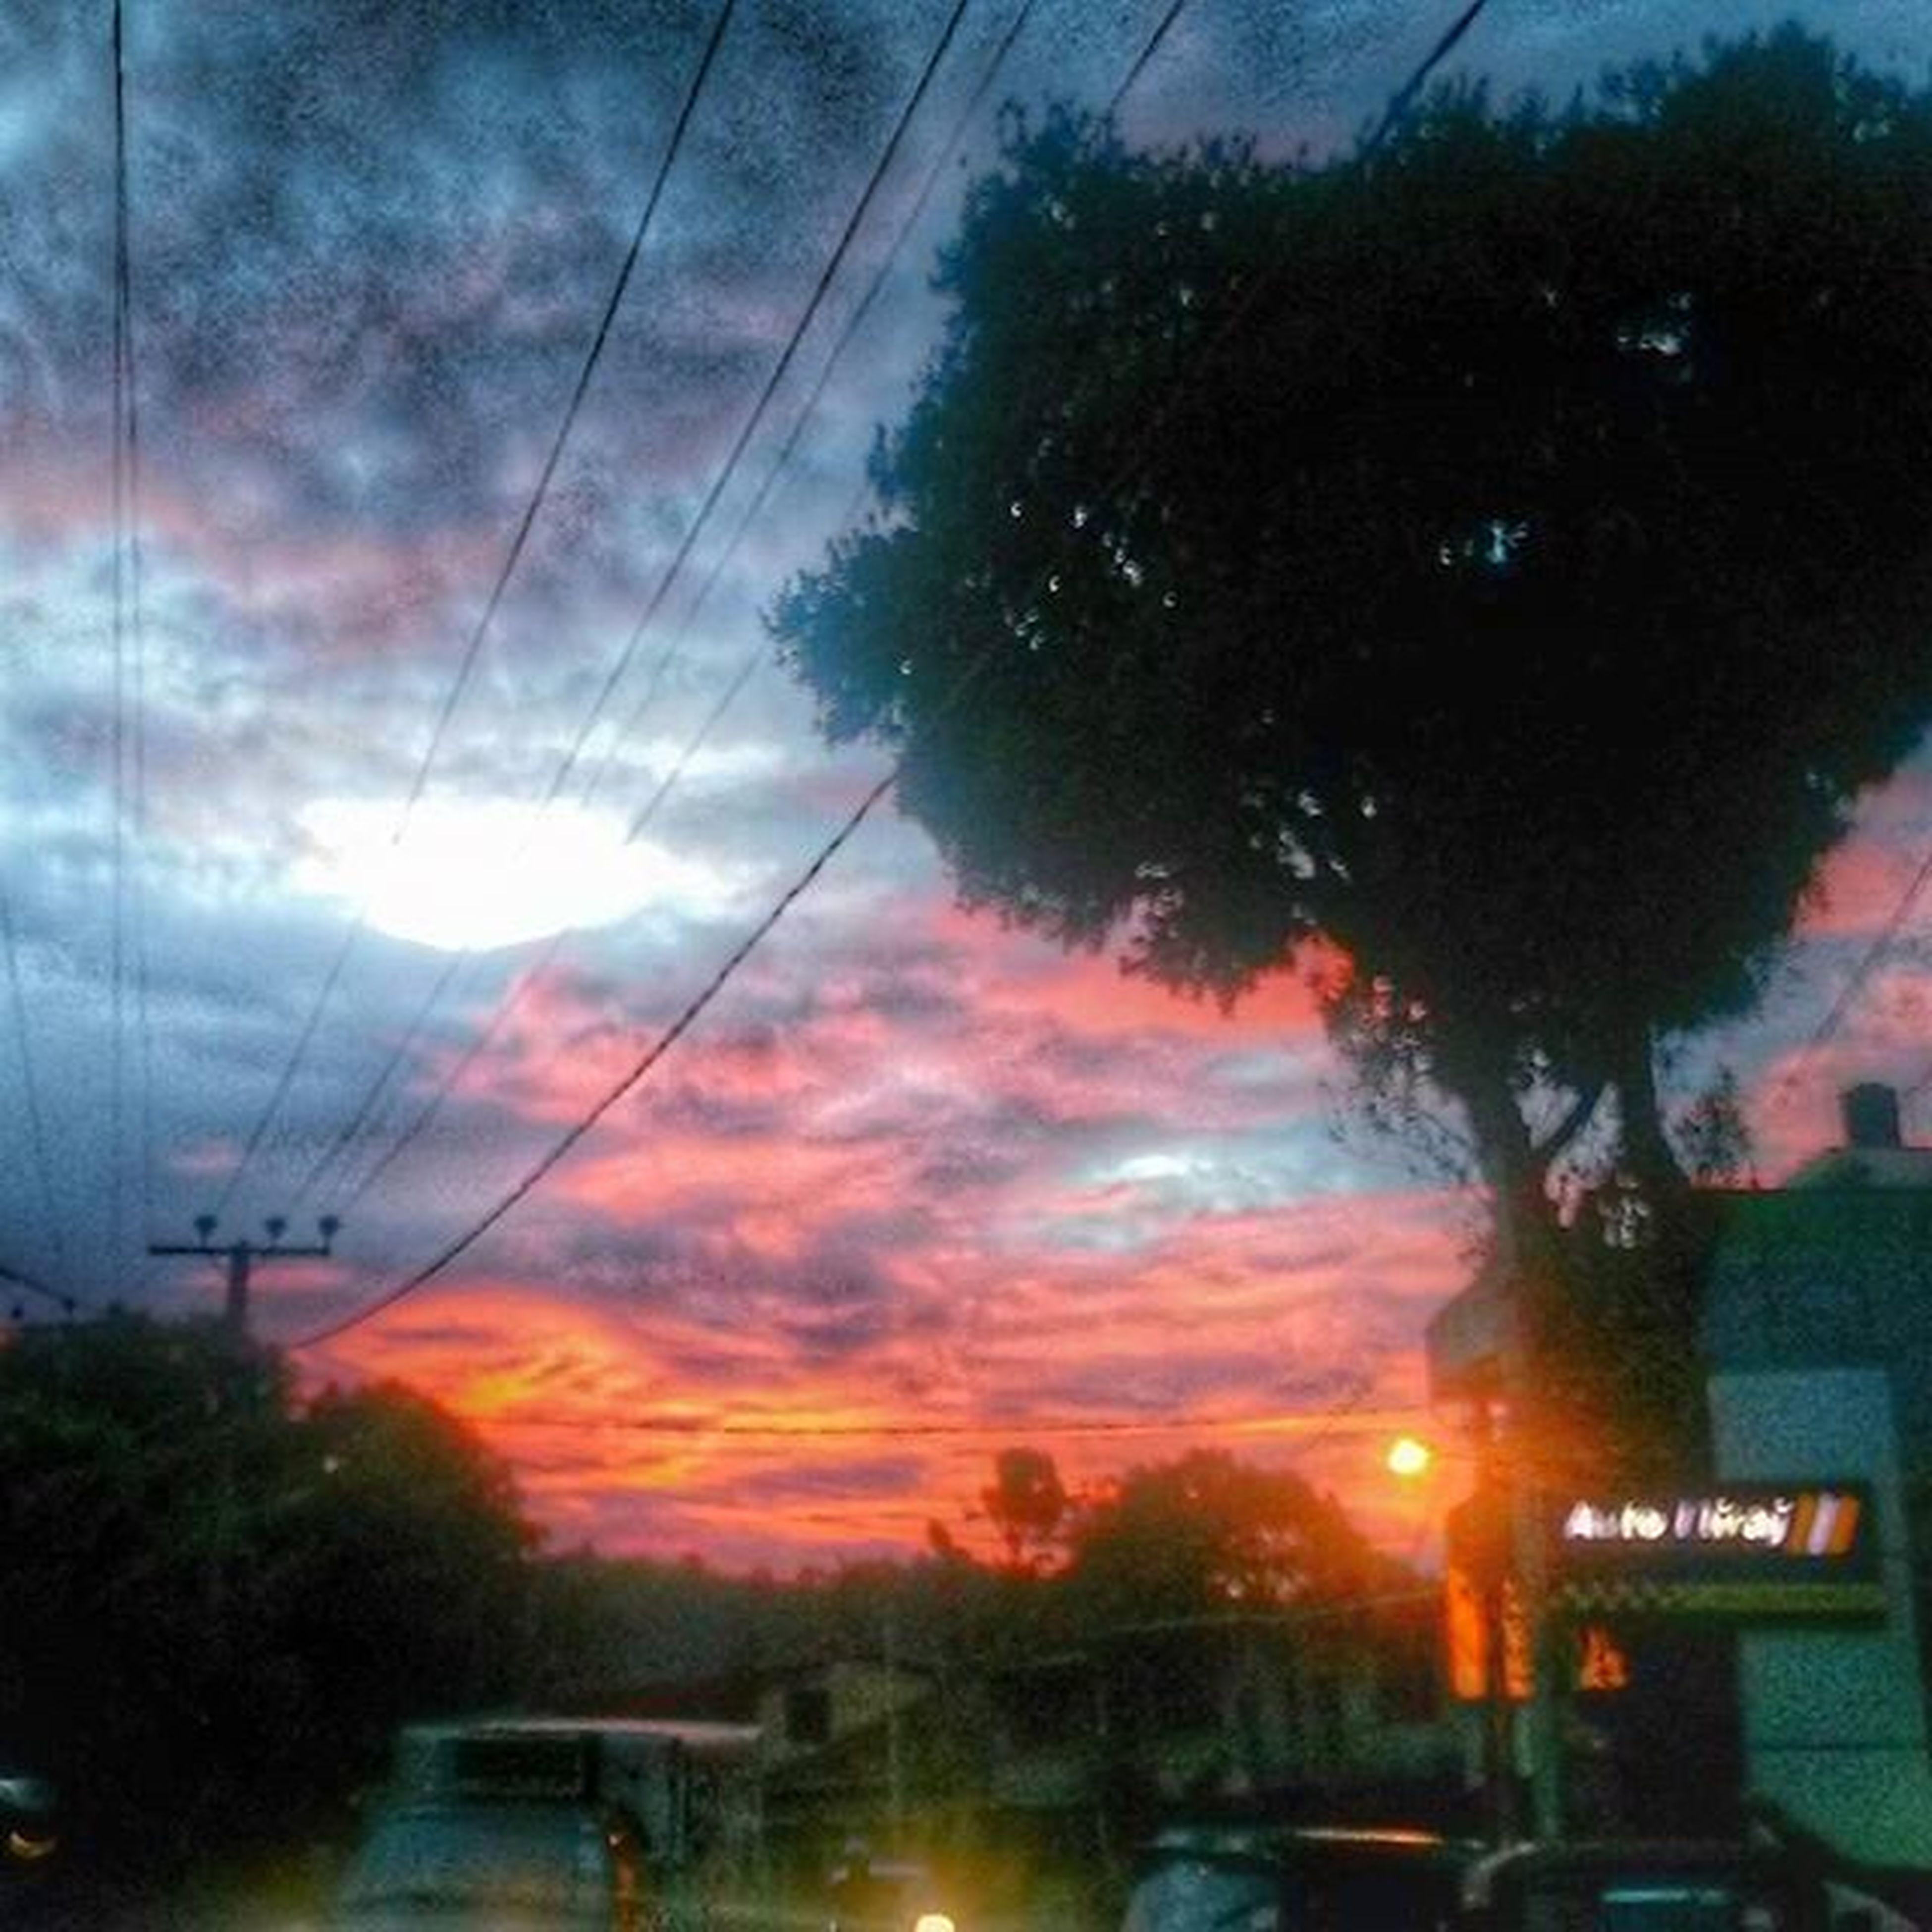 sunset, transportation, car, sky, land vehicle, mode of transport, cloud - sky, tree, road, silhouette, orange color, street, cloudy, power line, street light, cloud, nature, beauty in nature, electricity pylon, scenics